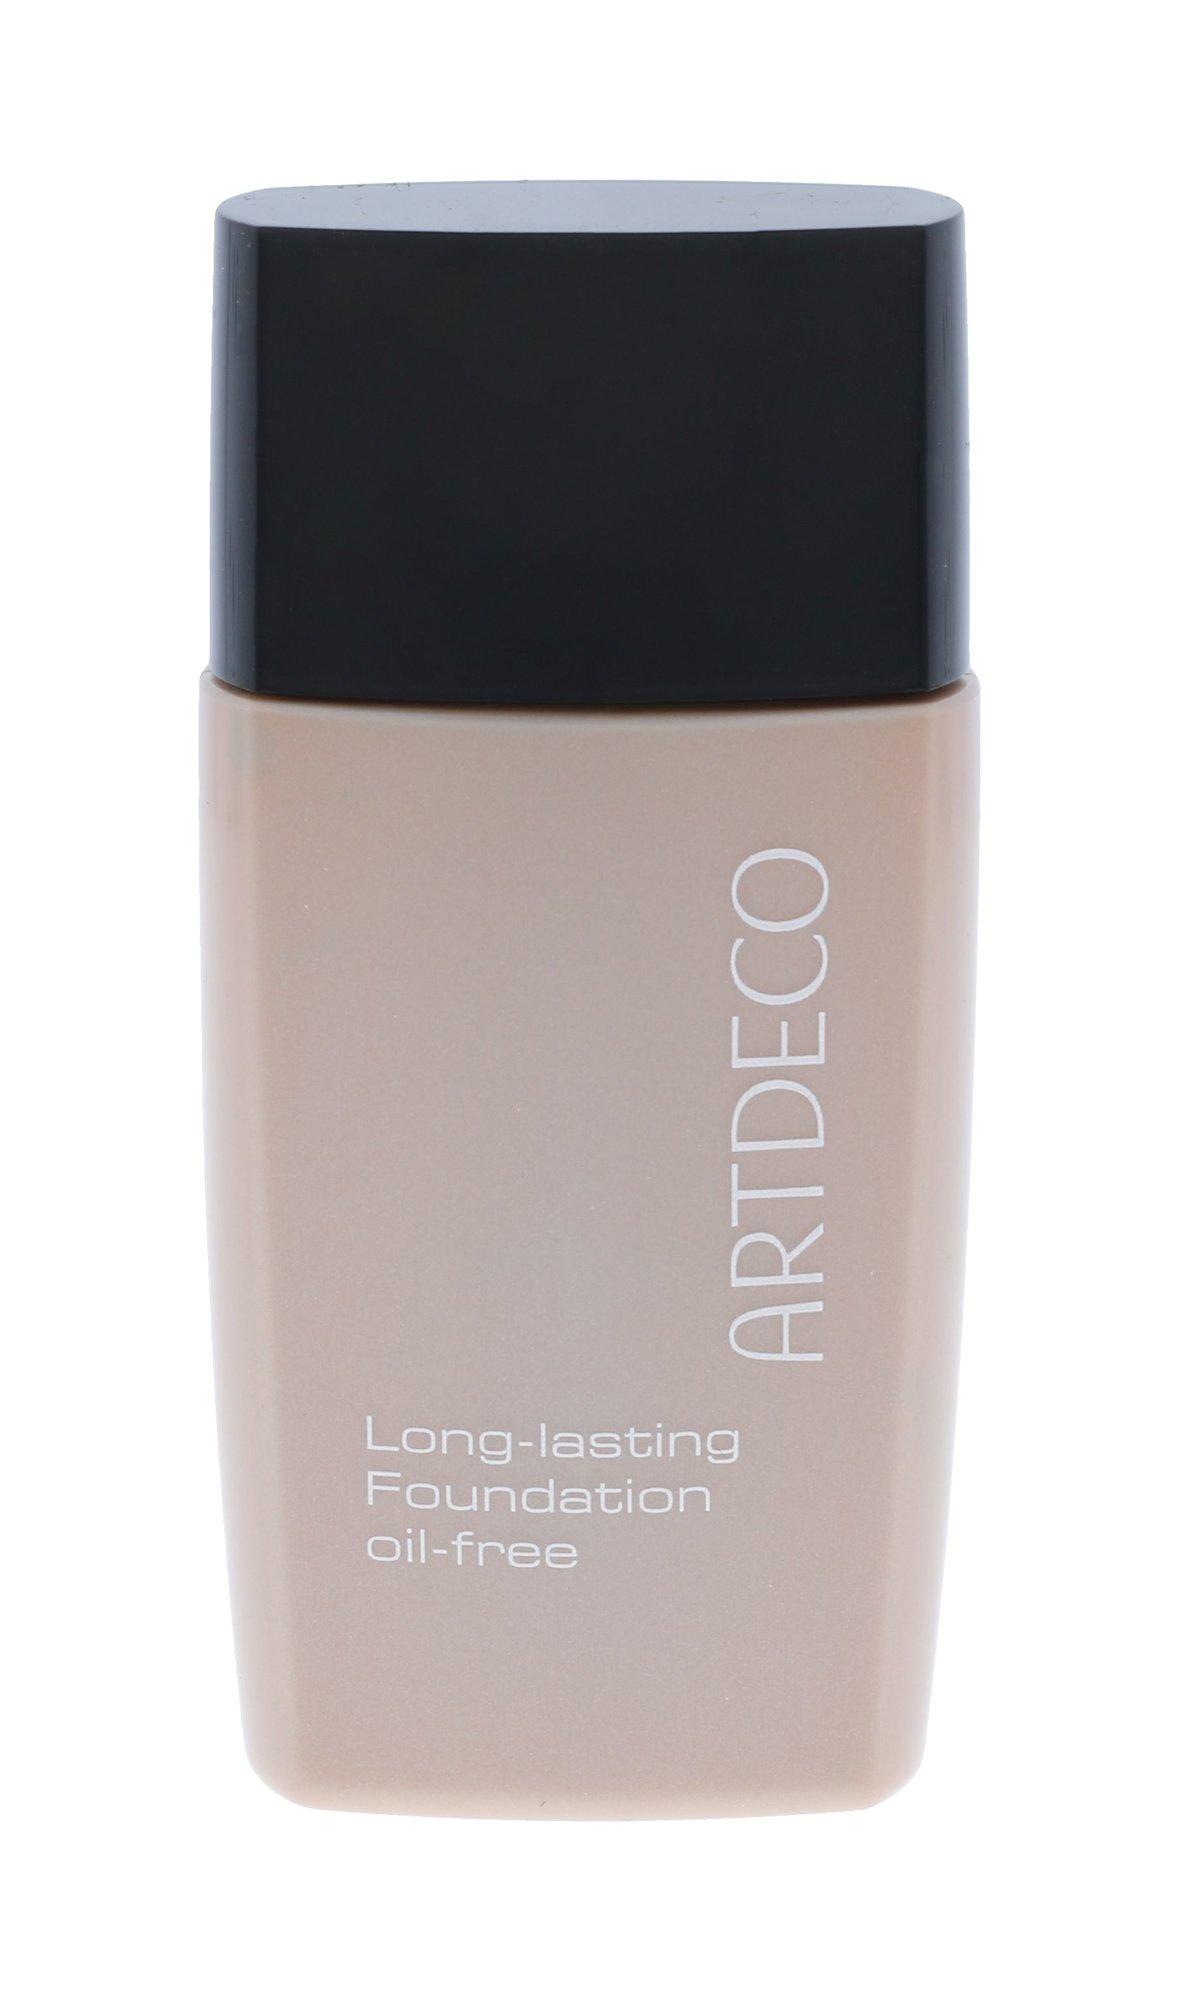 Artdeco Long Lasting Foundation Oil-Free Cosmetic 30ml 25 Light Cognac